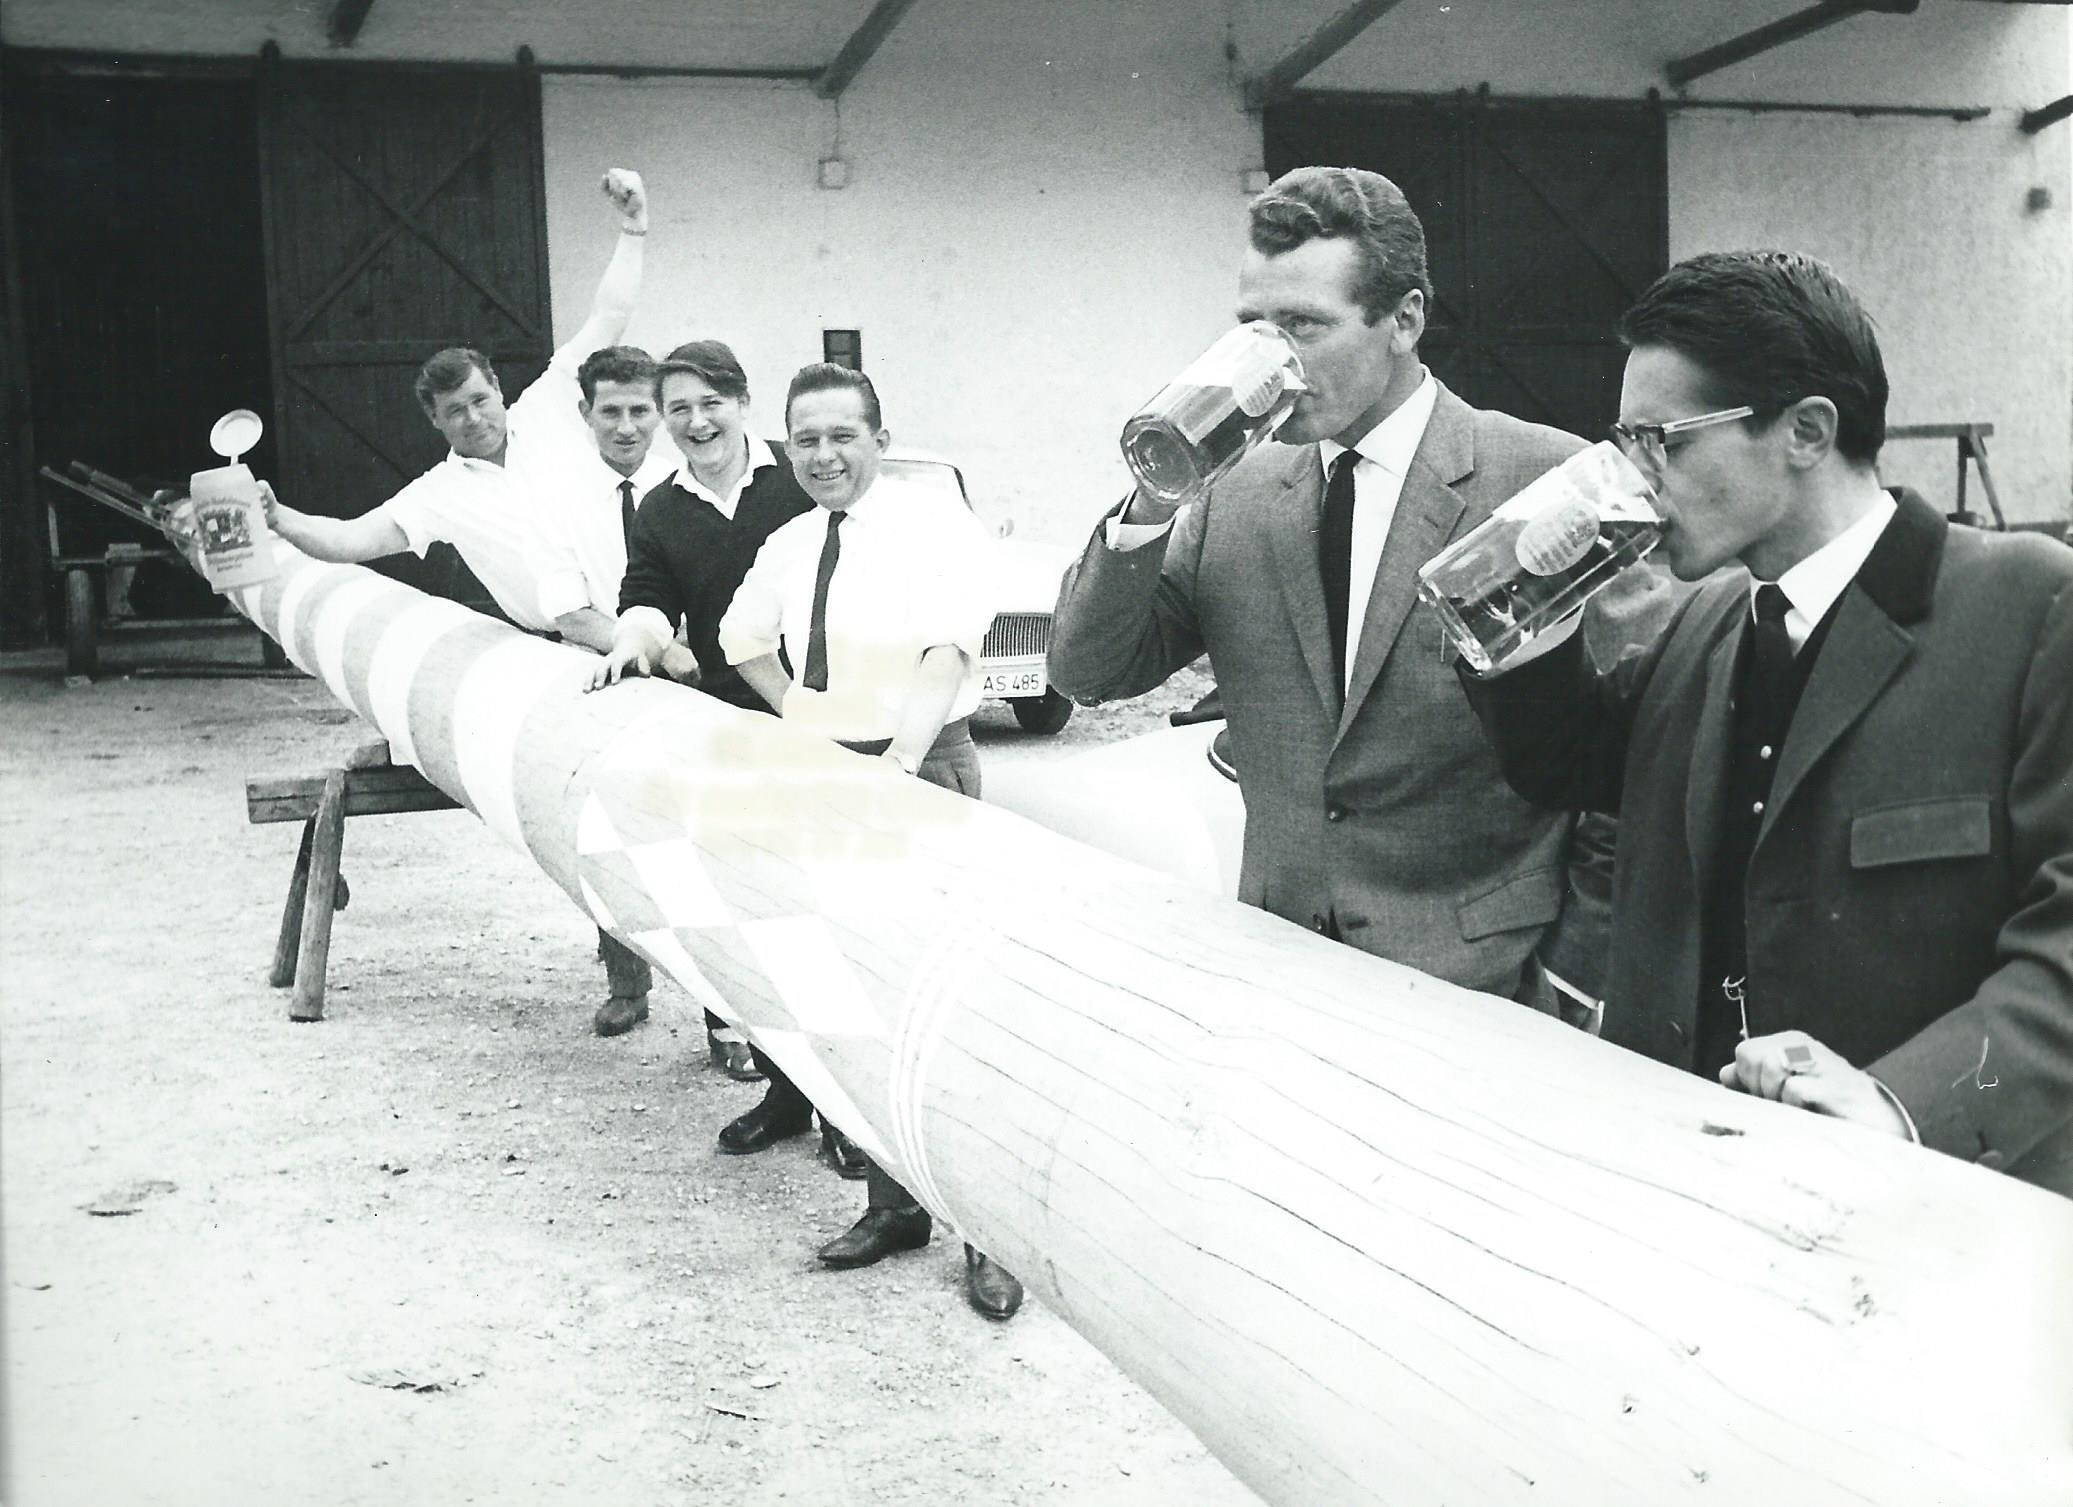 Massenhausener Maibaumräuber 1964